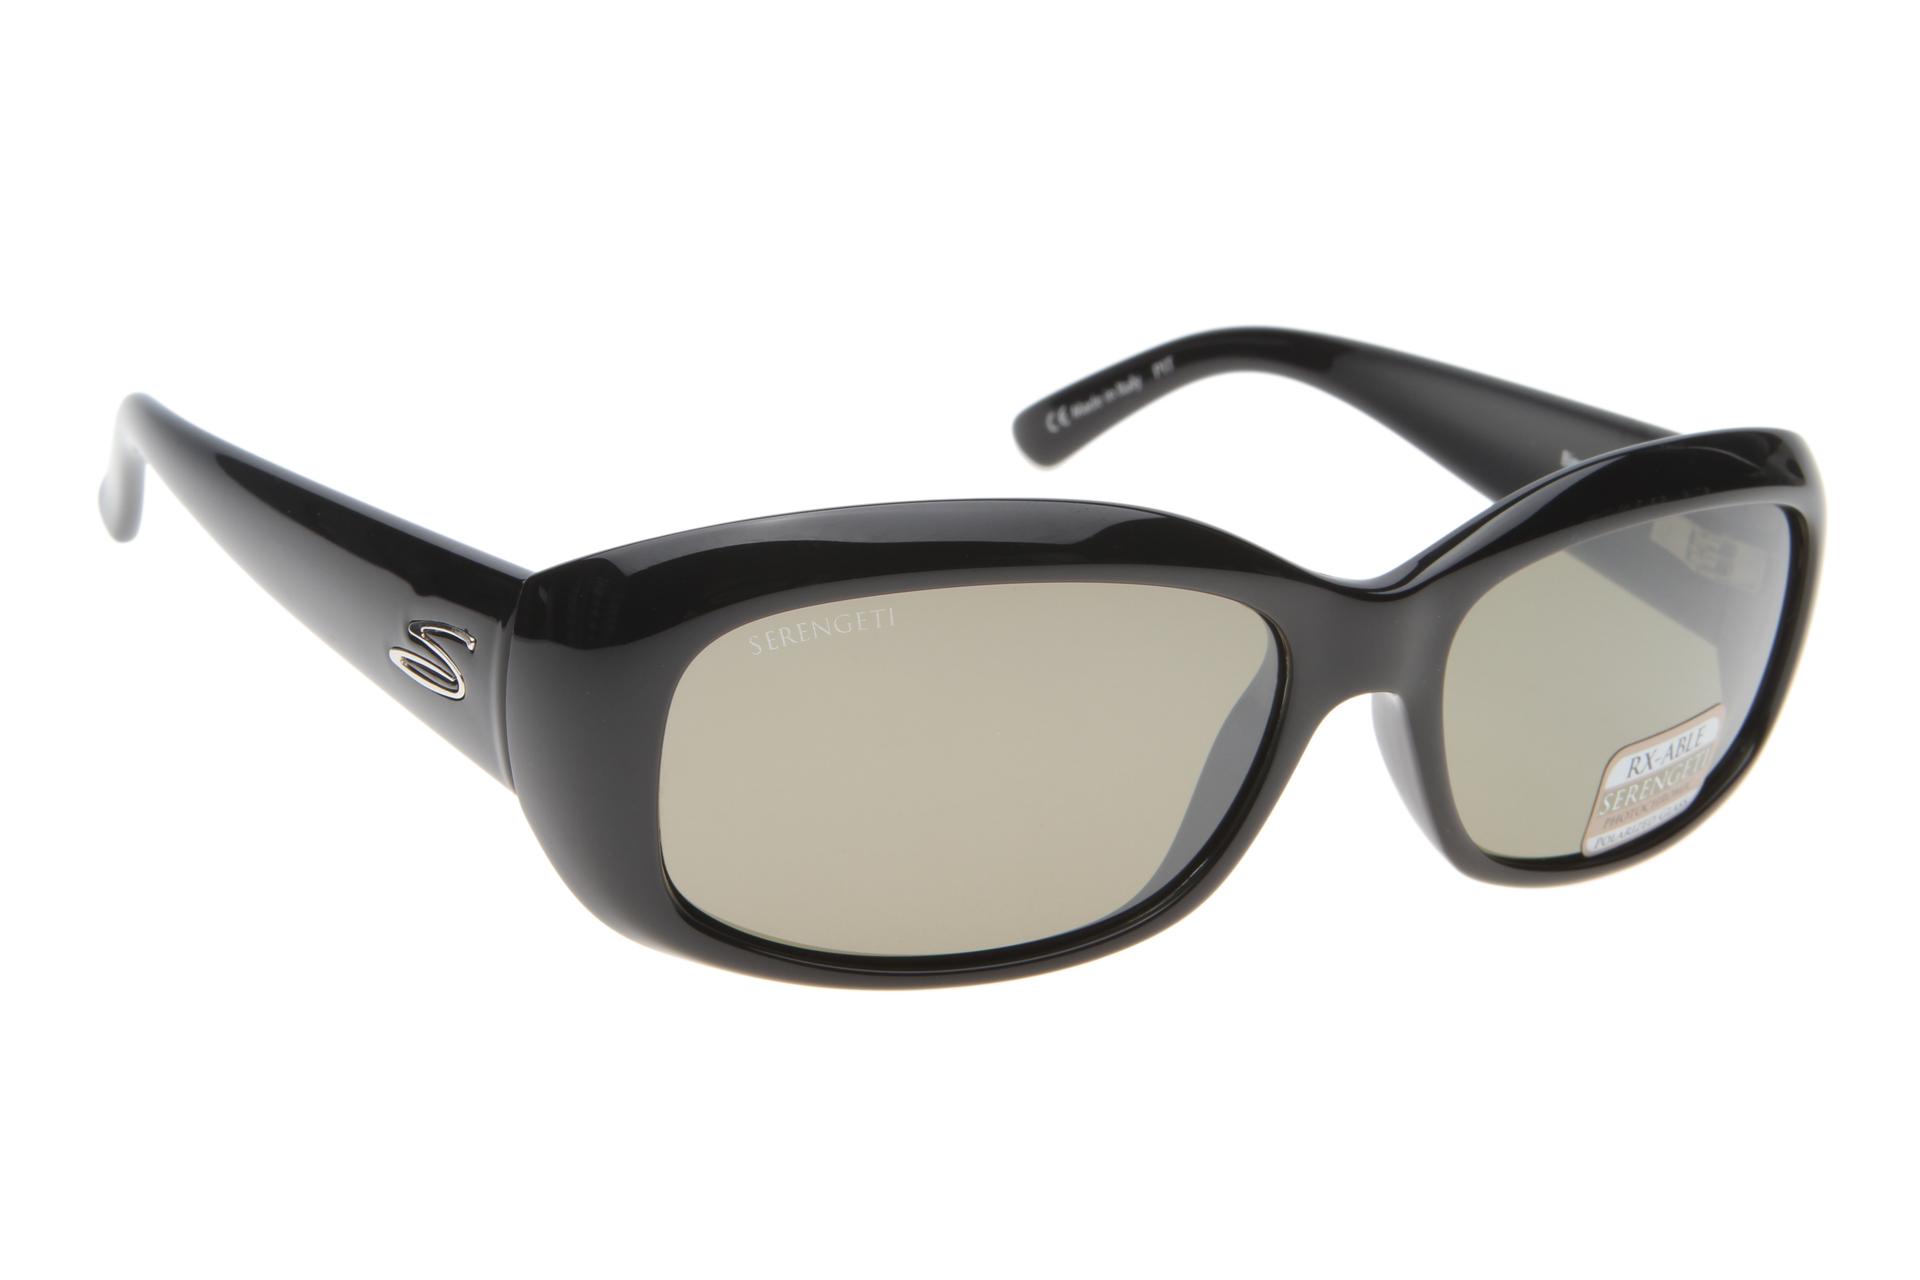 5055feda19cd6f Serengeti Bianca 7364 (Shiny Black) Gepolariseerd zonnebril